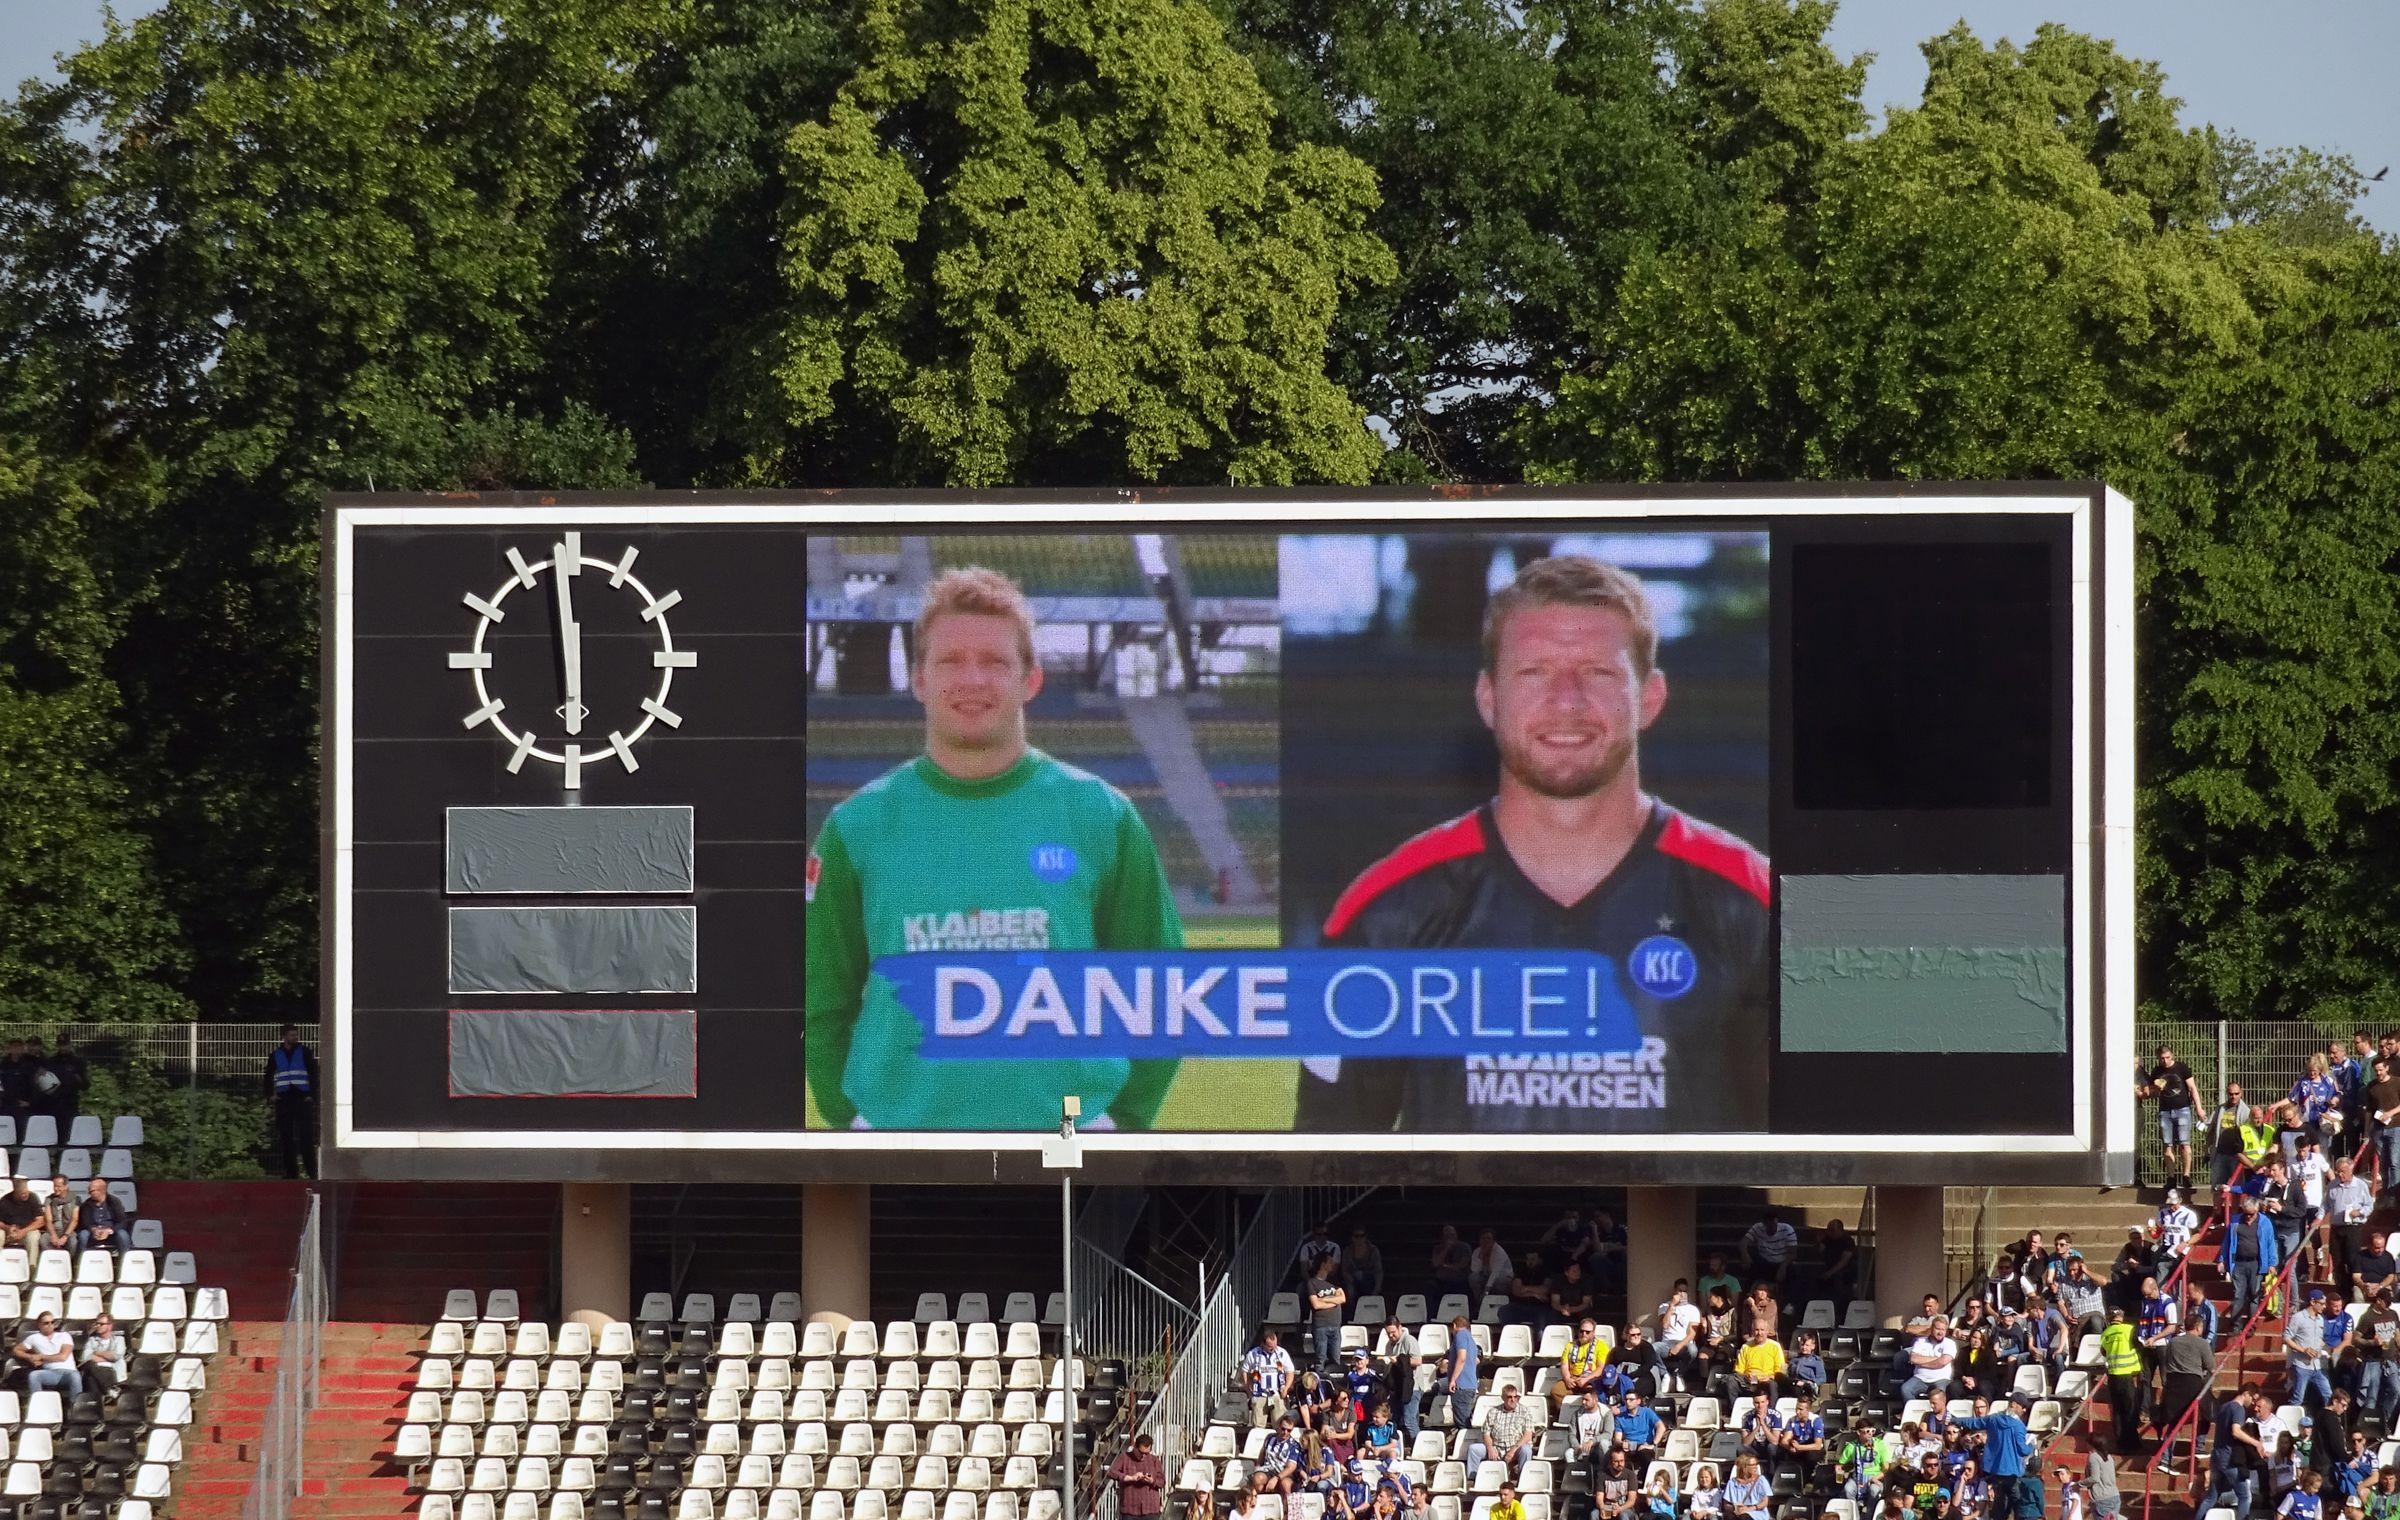 Danke Orle!